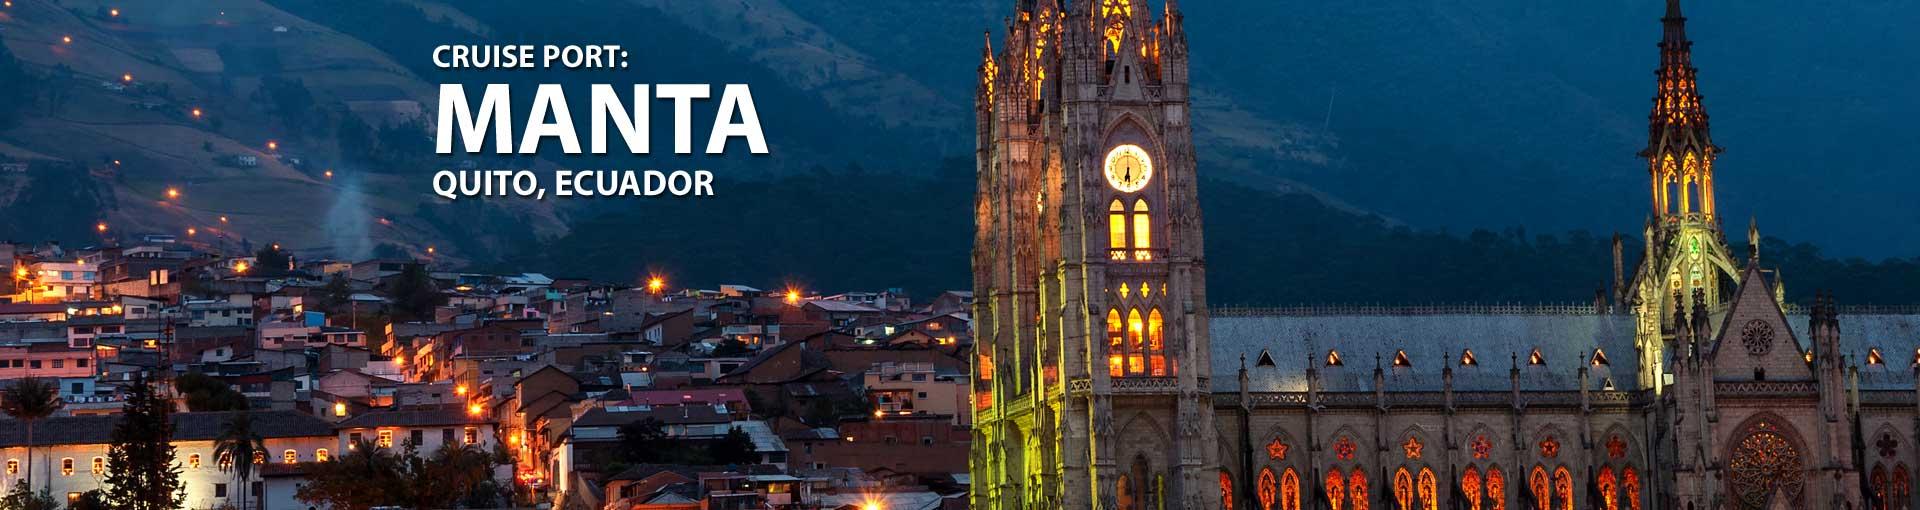 Cruises to Manta, Quito, Ecuador